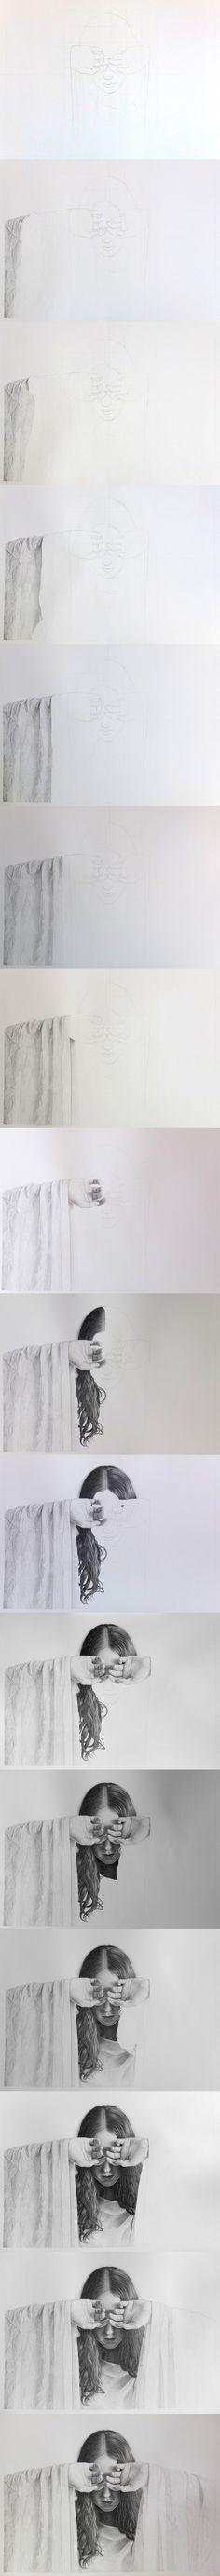 Untitled - work in progress by jm78.deviantart.com on @DeviantArt